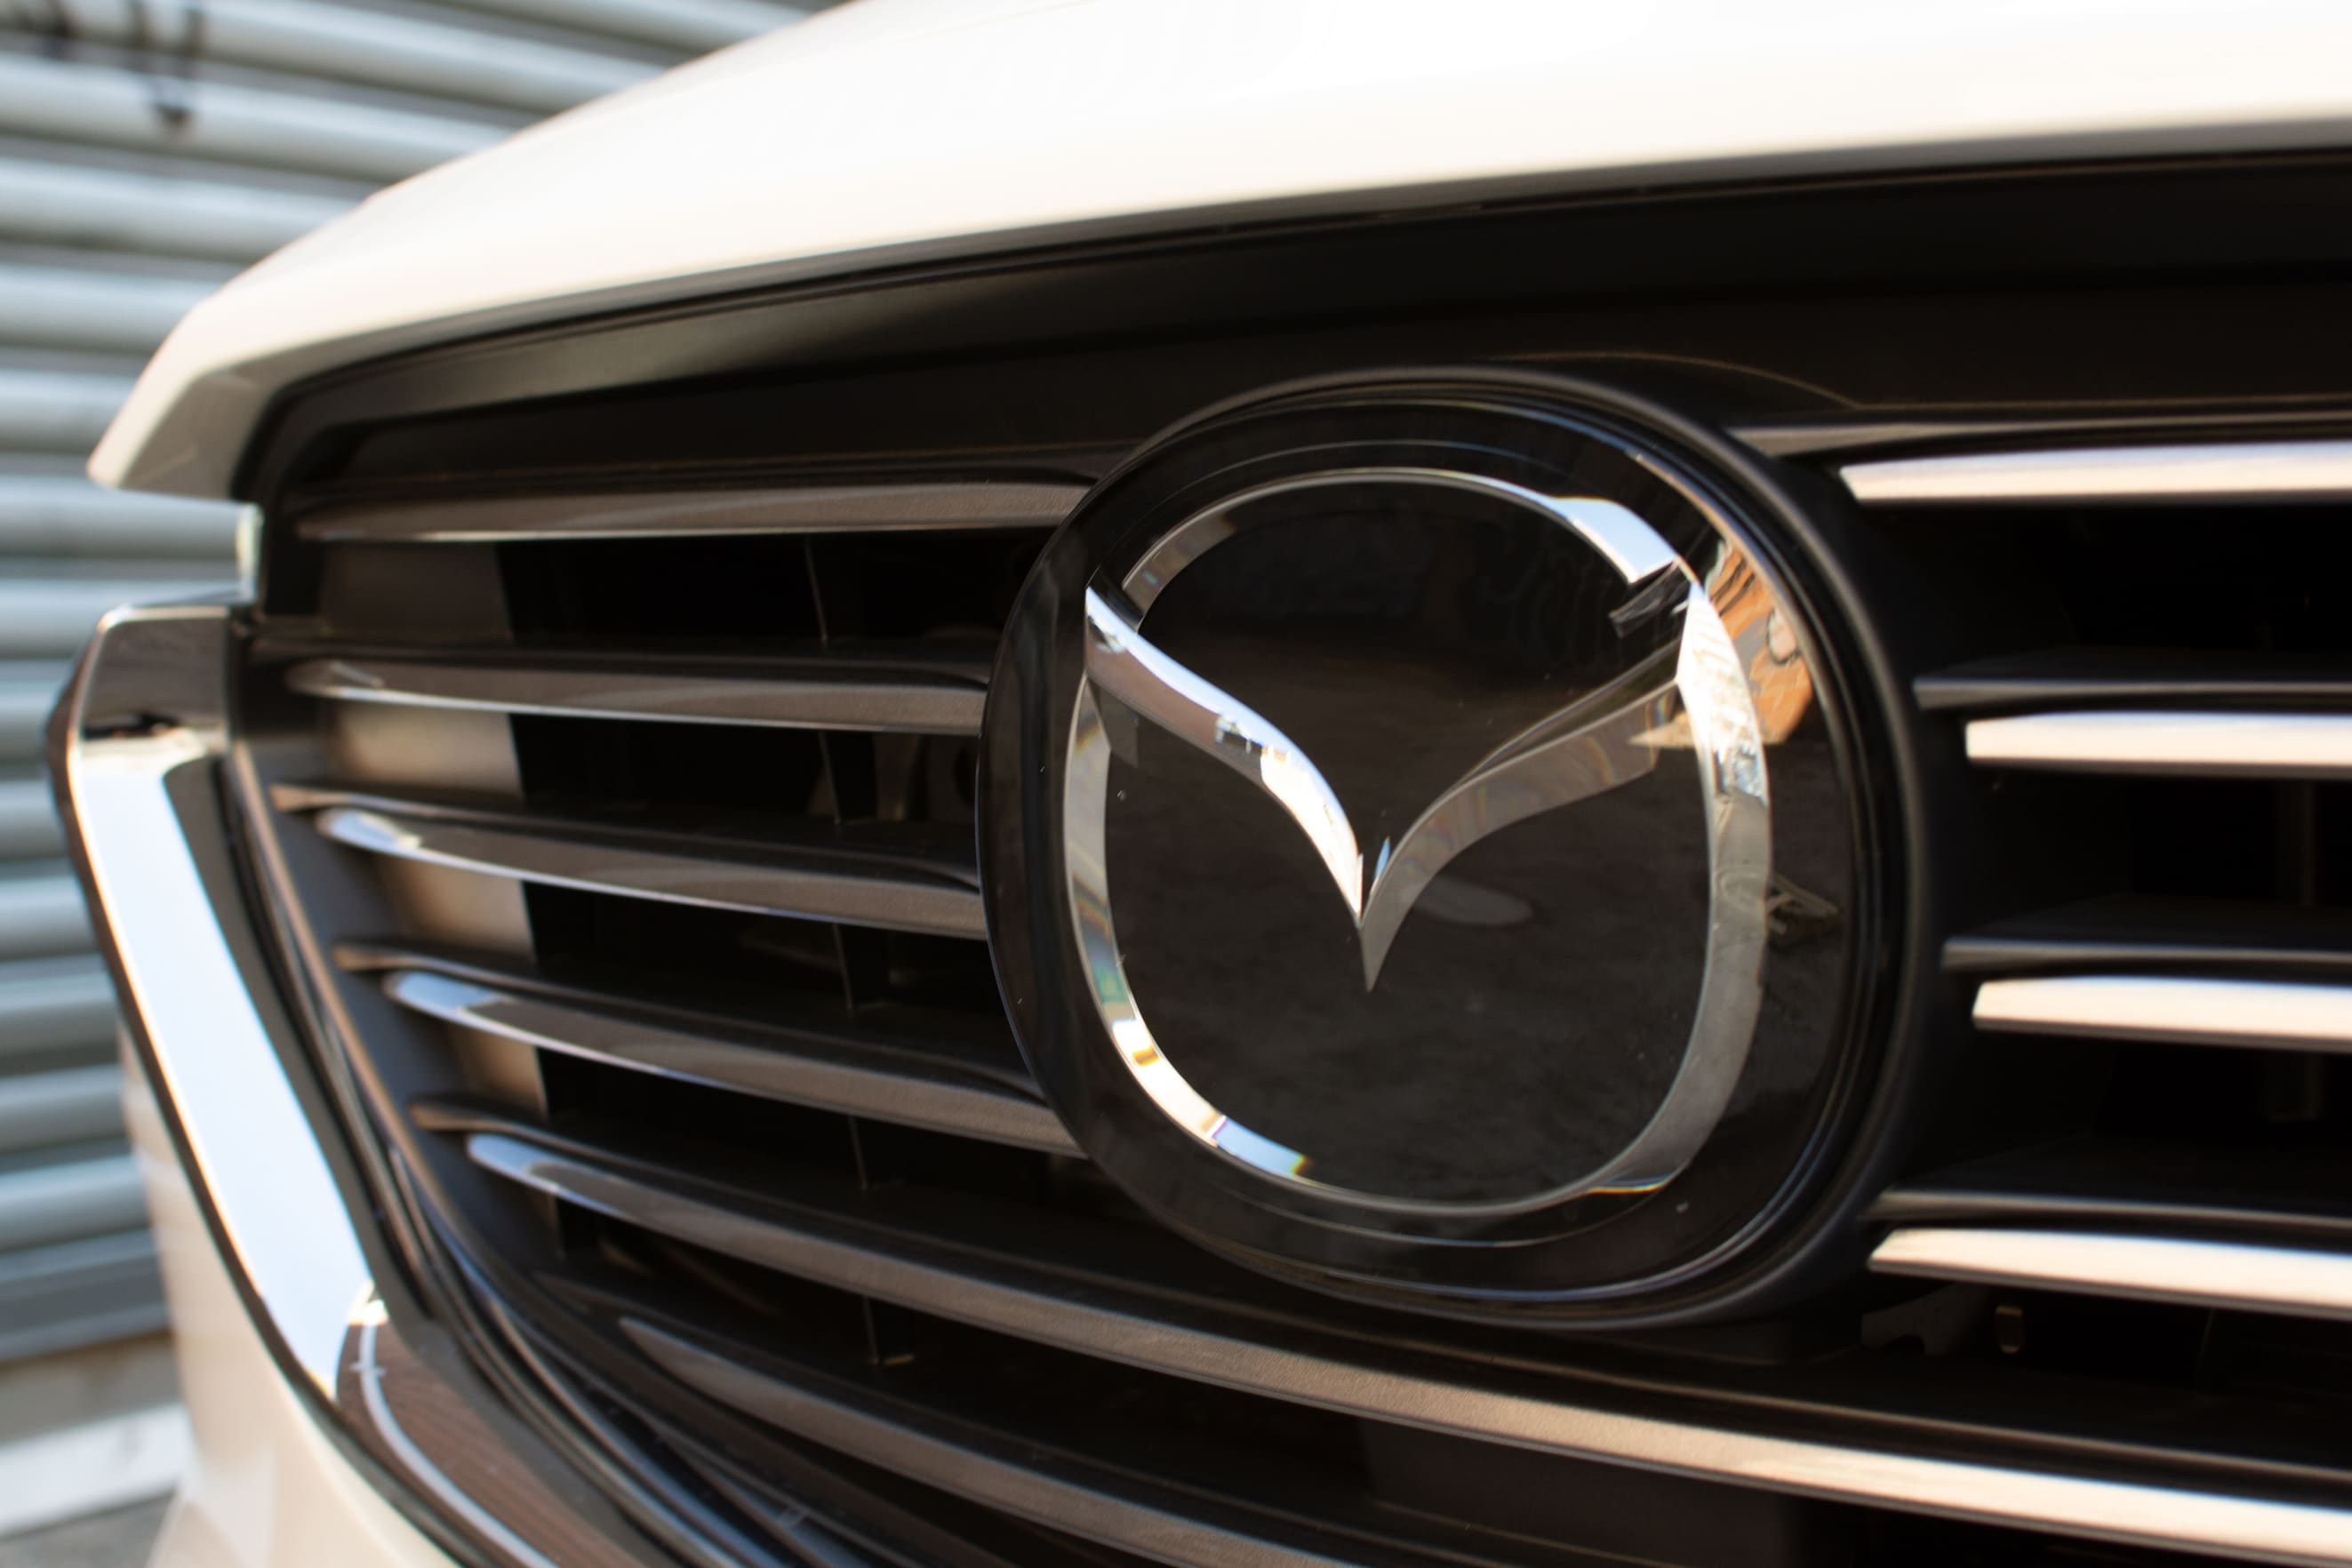 Mazda 3 Owners Manual: Schedule 1